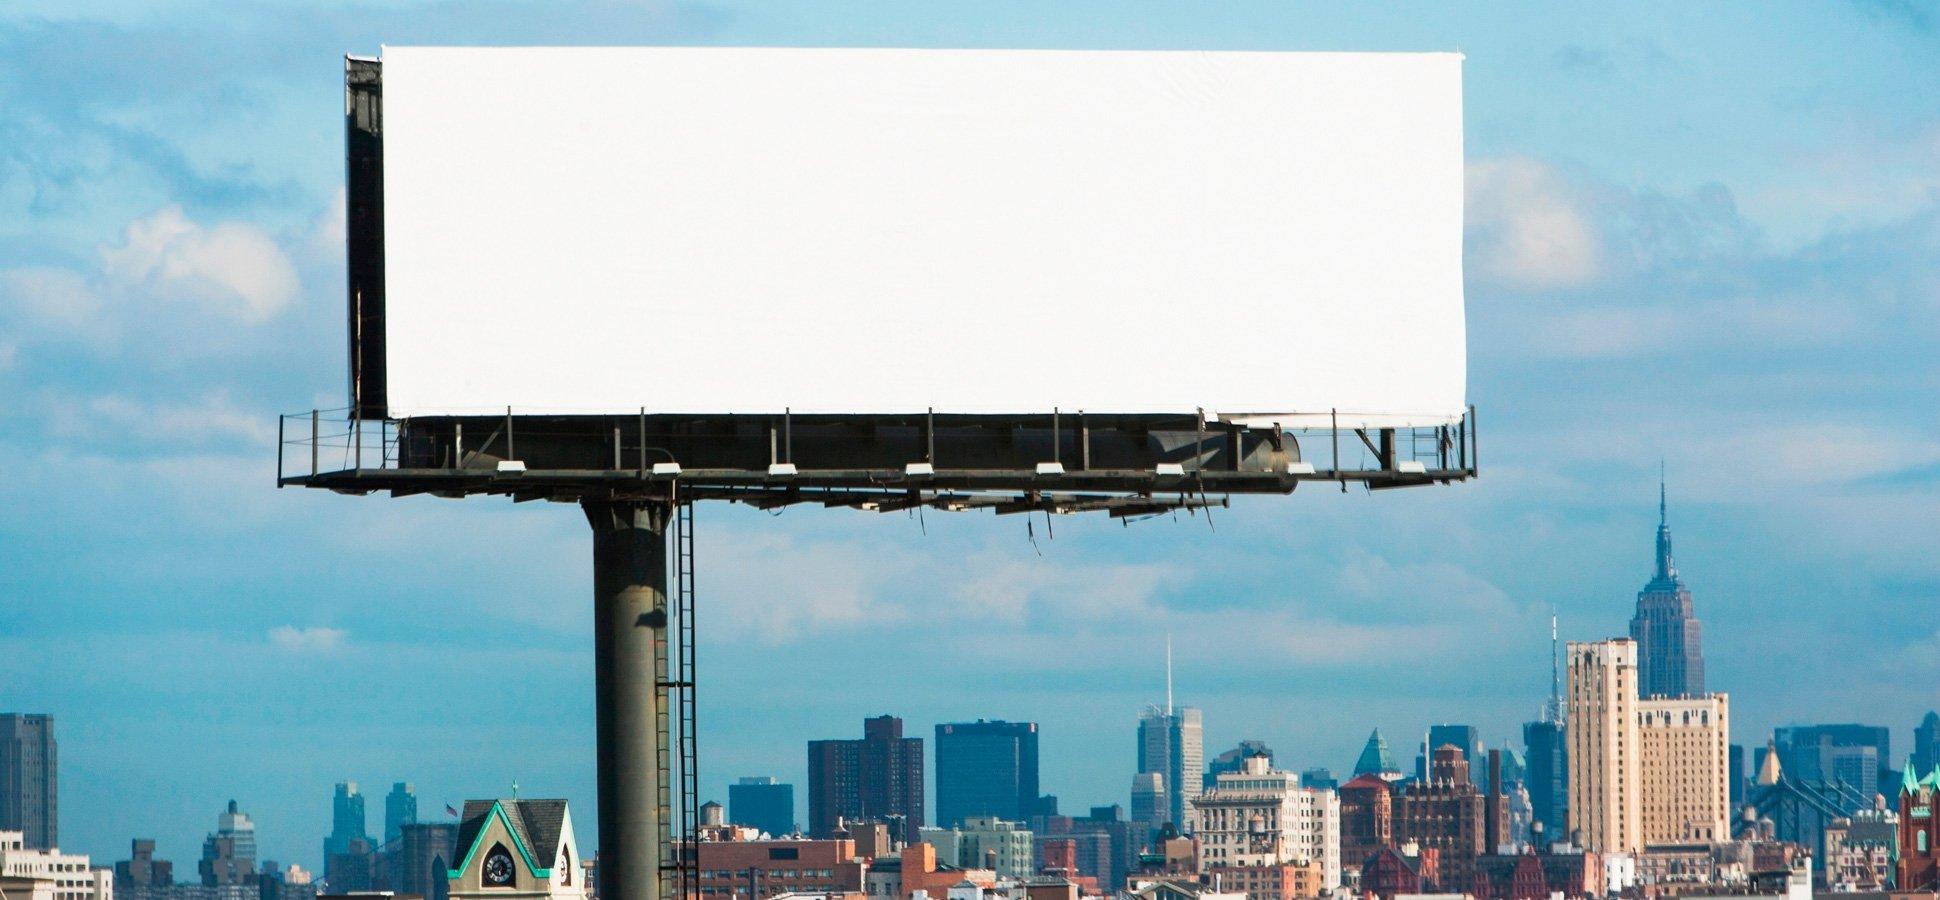 Pasang iklan billboard